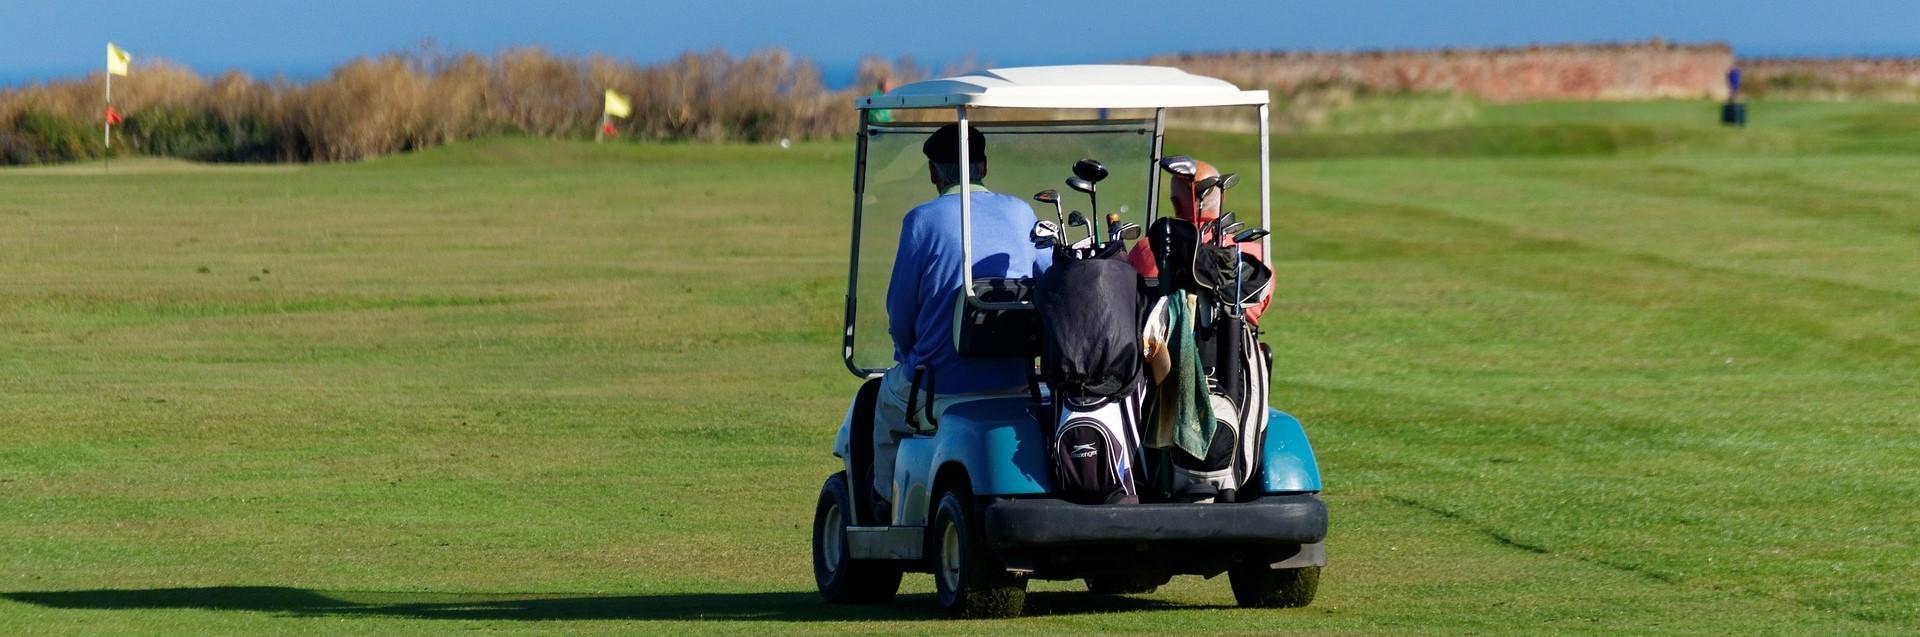 Golf Cart in Texas - CarDonations4Cancer.org